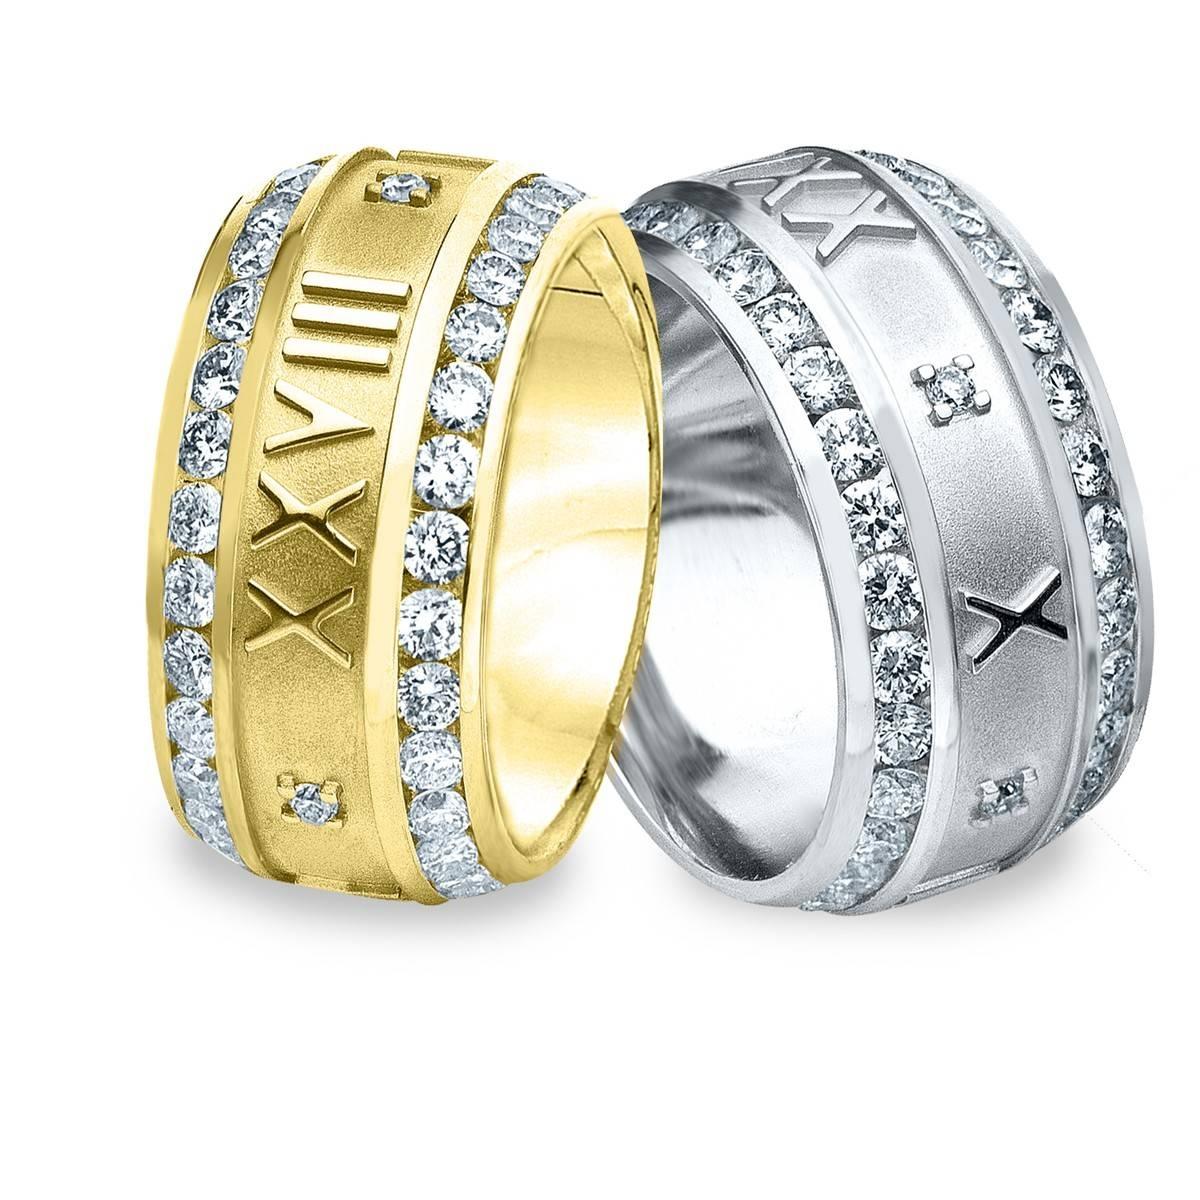 Mens Eternity Diamond Rings | Wedding, Promise, Diamond Within Latest Anniversary Rings For Men (View 4 of 25)